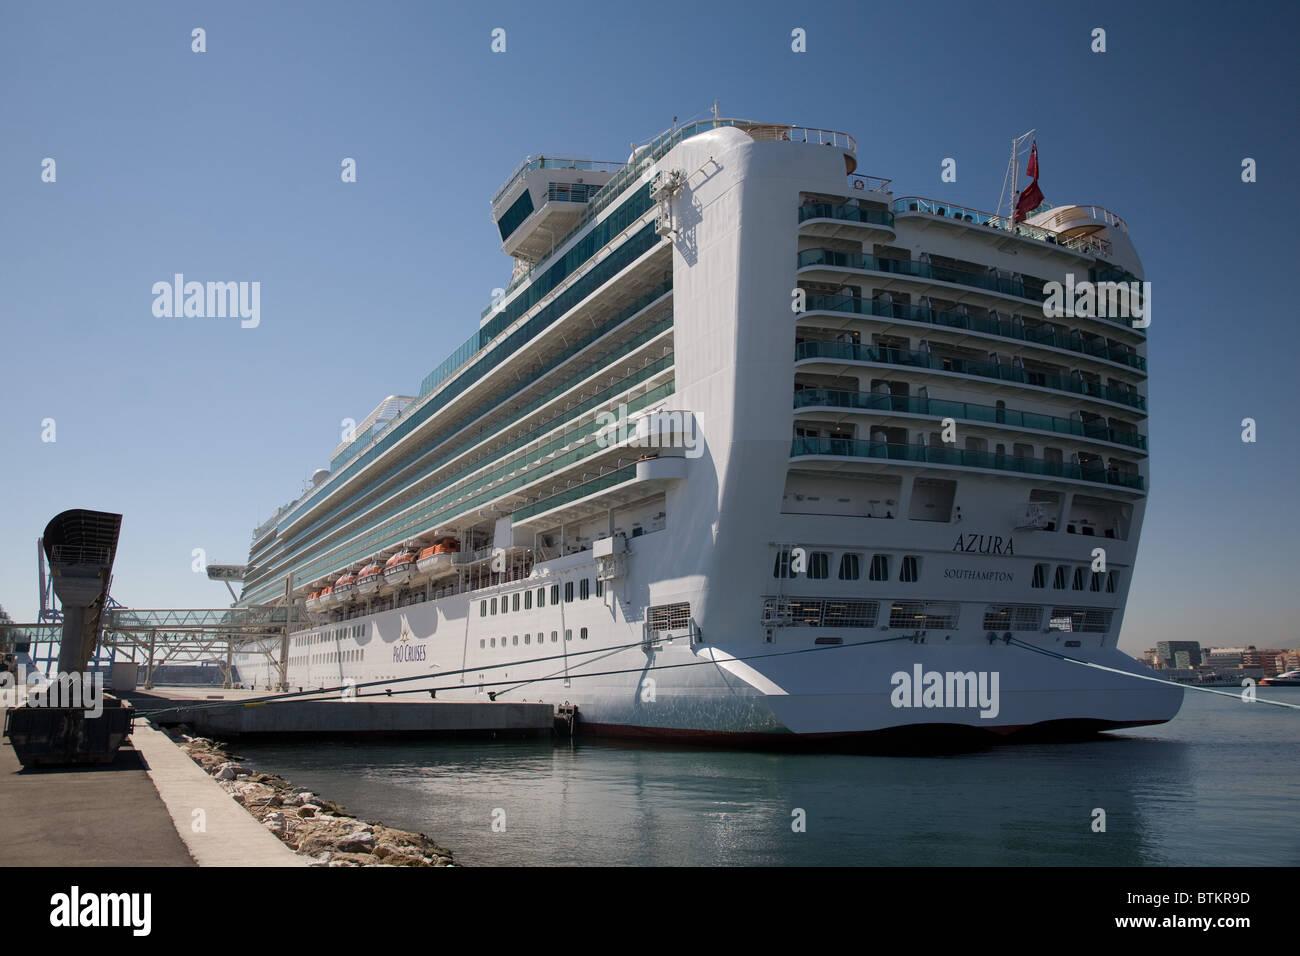 P And O P O Cruise Ship Azura Stock Photo Royalty Free Image - P and o cruises ships